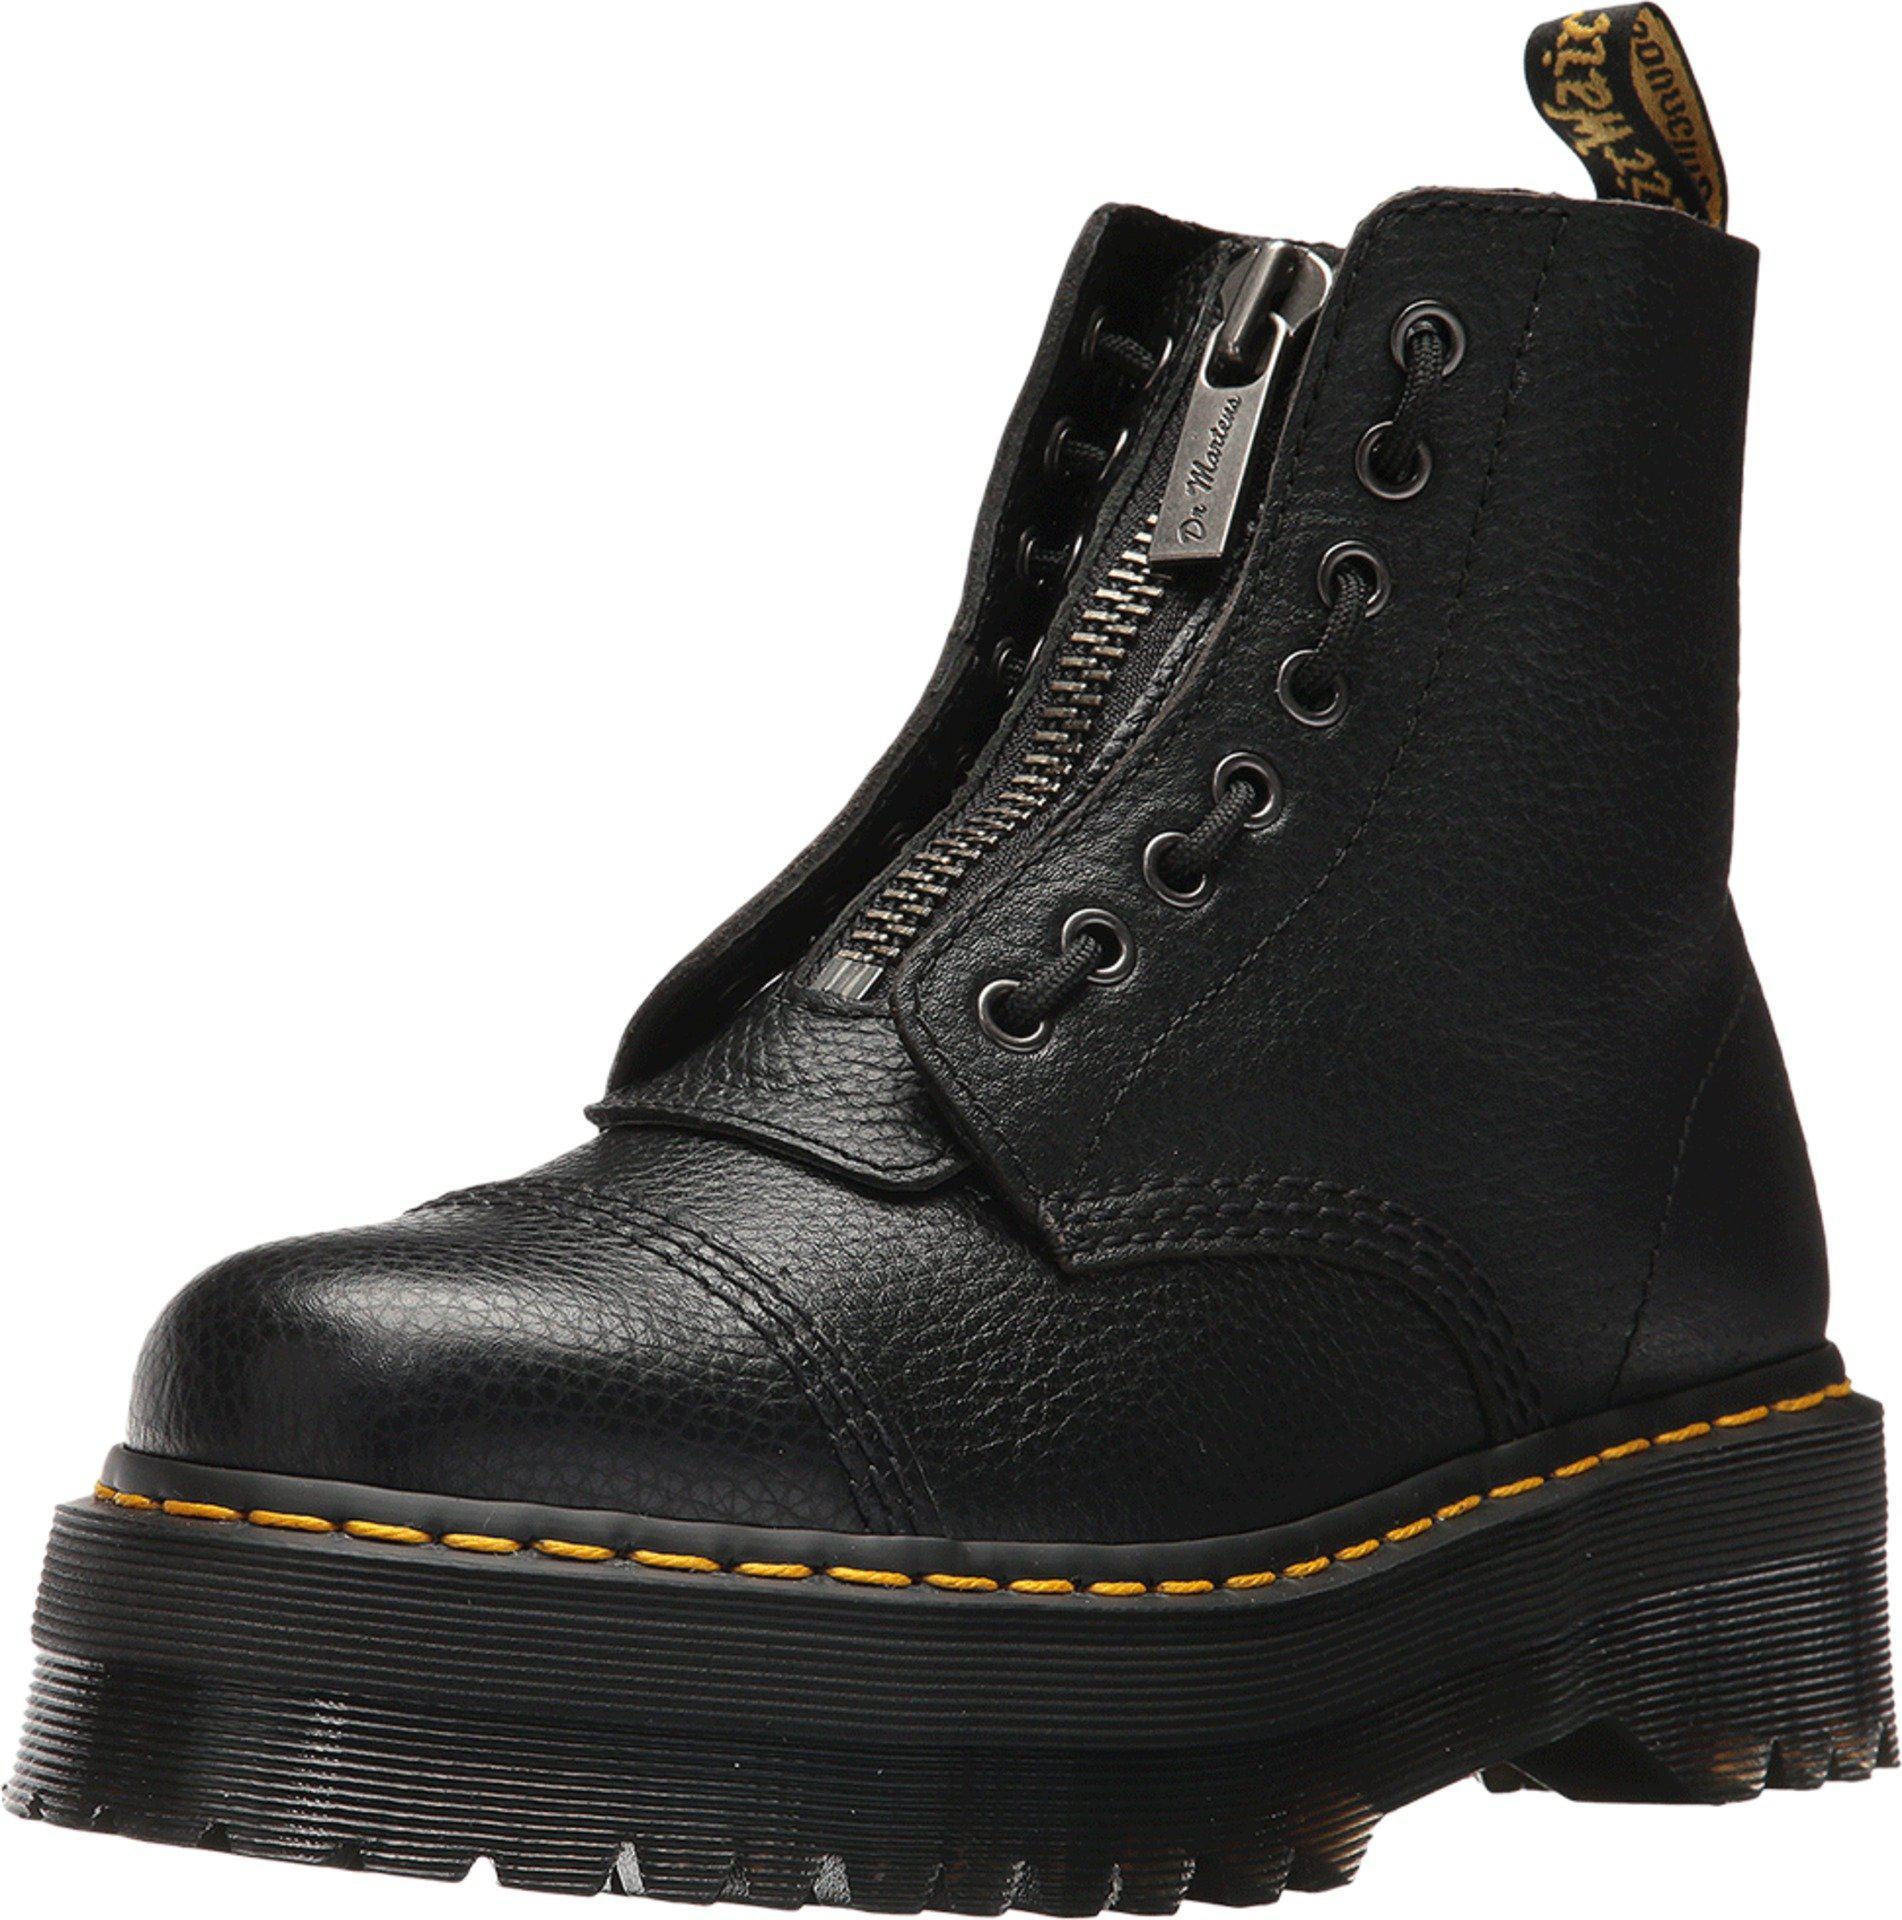 5ac0f2357369 Lyst - Dr. Martens Sinclair Jungle Boot in Black